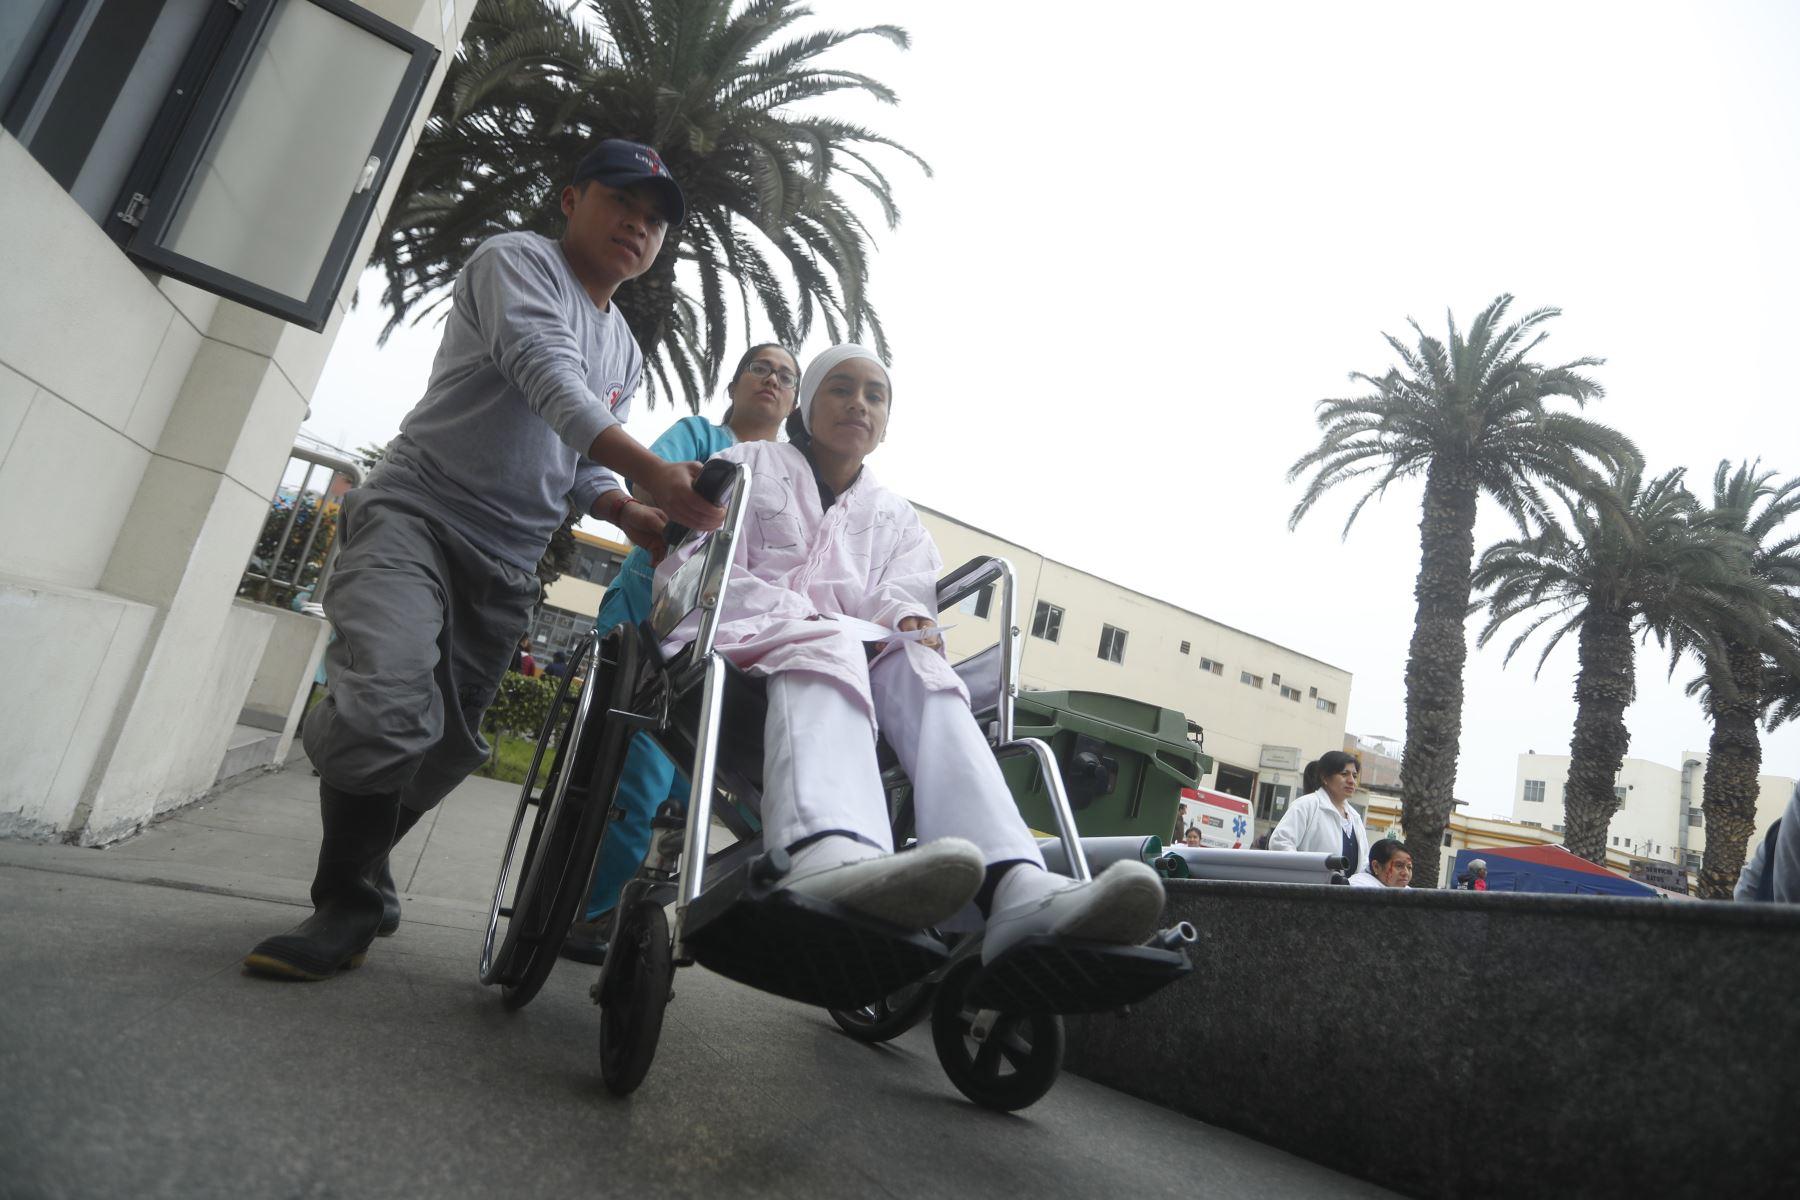 Pacientes son evacuados a zonas seguras. Foto: ANDINA/Josue Ramos